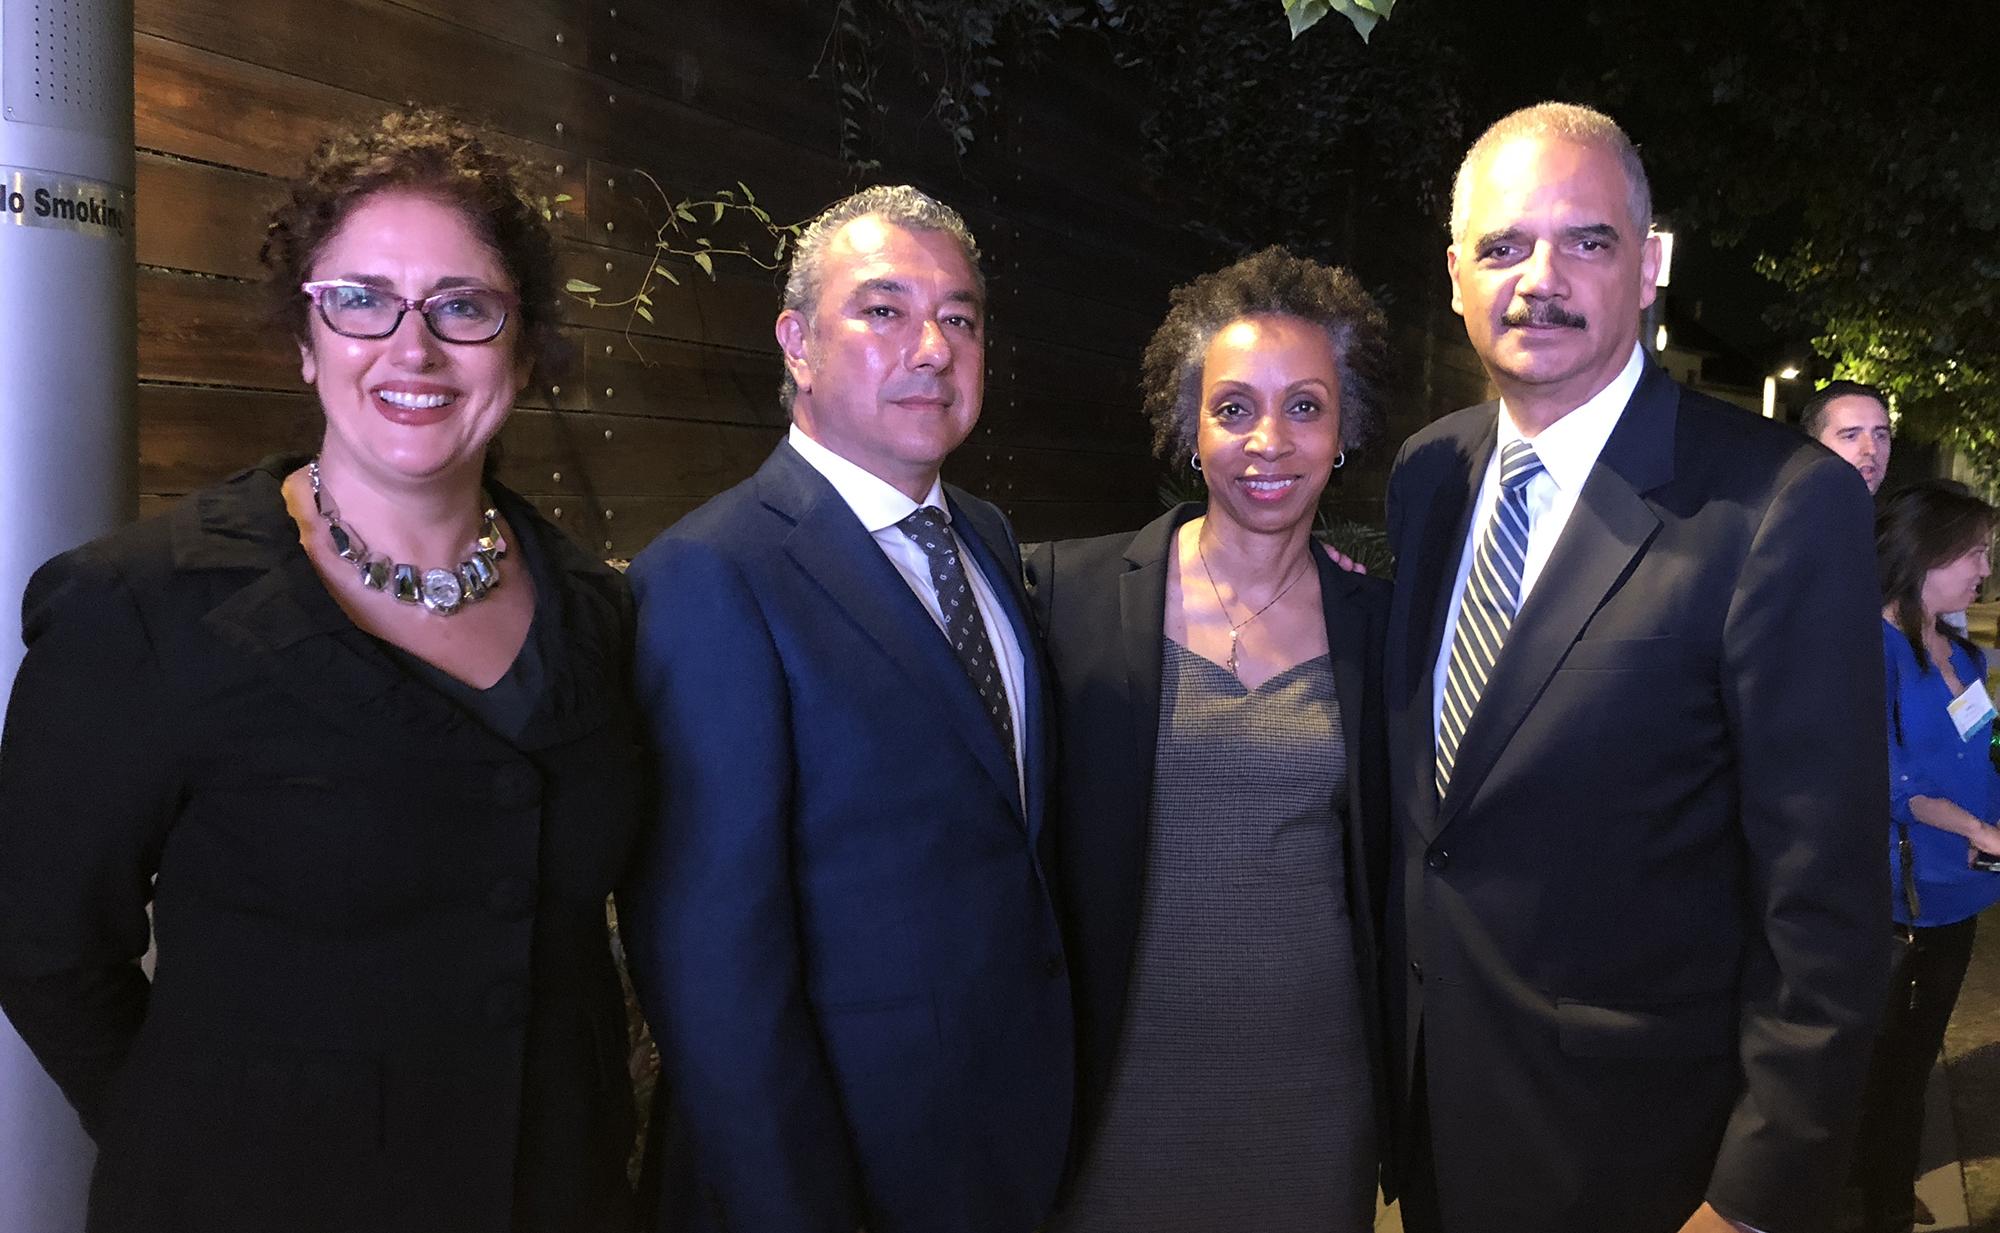 Photo of Heather L. Rosing, Leo Trujillo-Cox, Nina Shaw, and Eric Holder